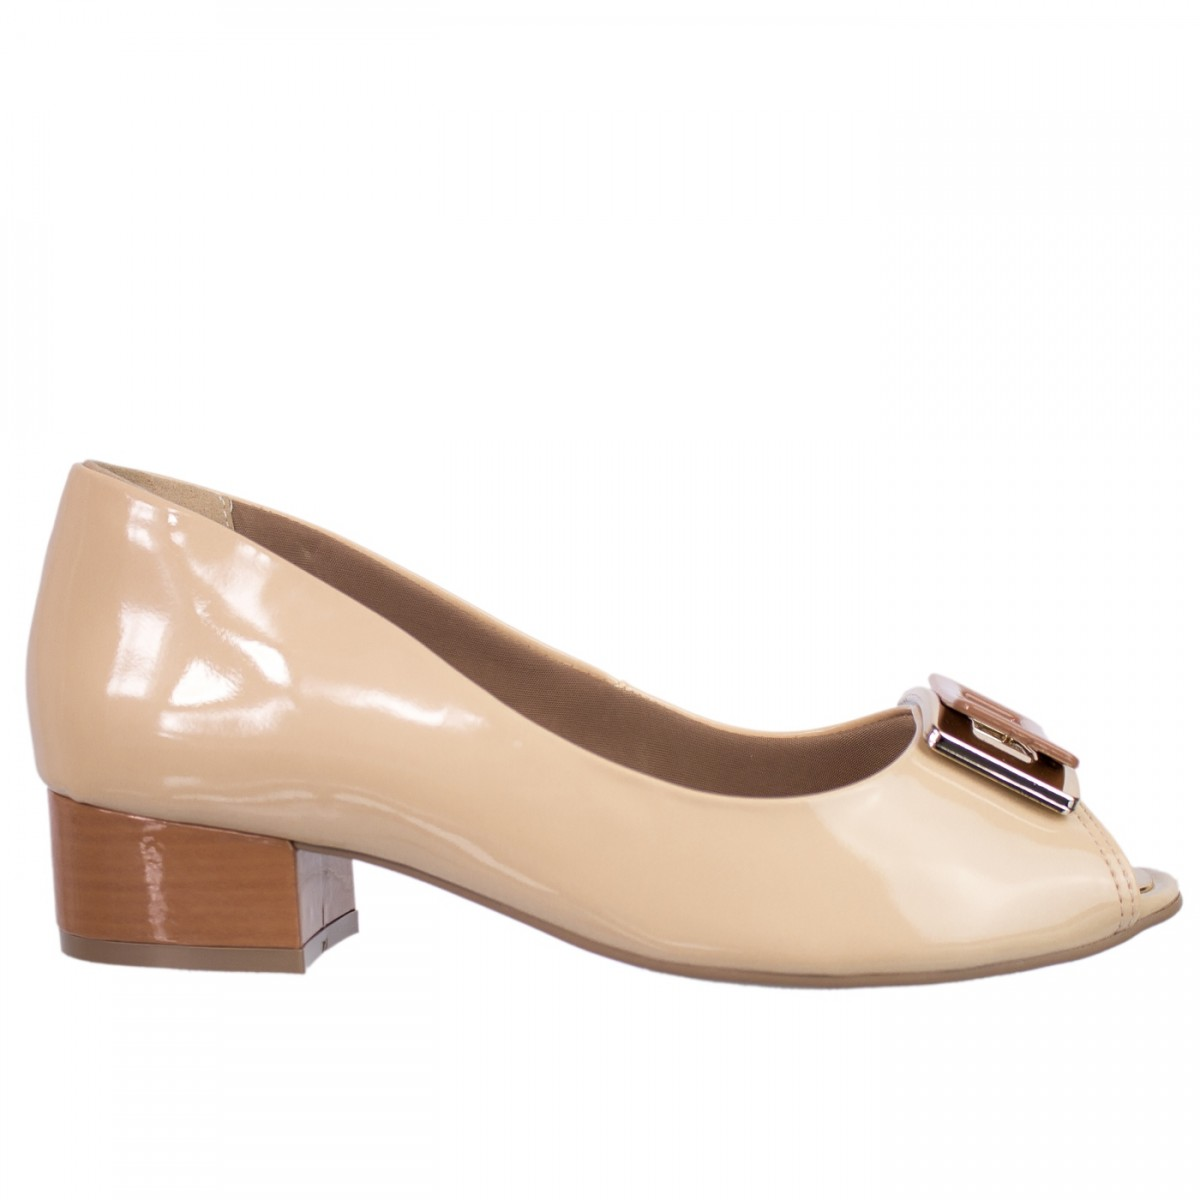 058927652 Bizz Store - Sapato Peep Toe Feminino Ramarim Caramelo Salto Baixo